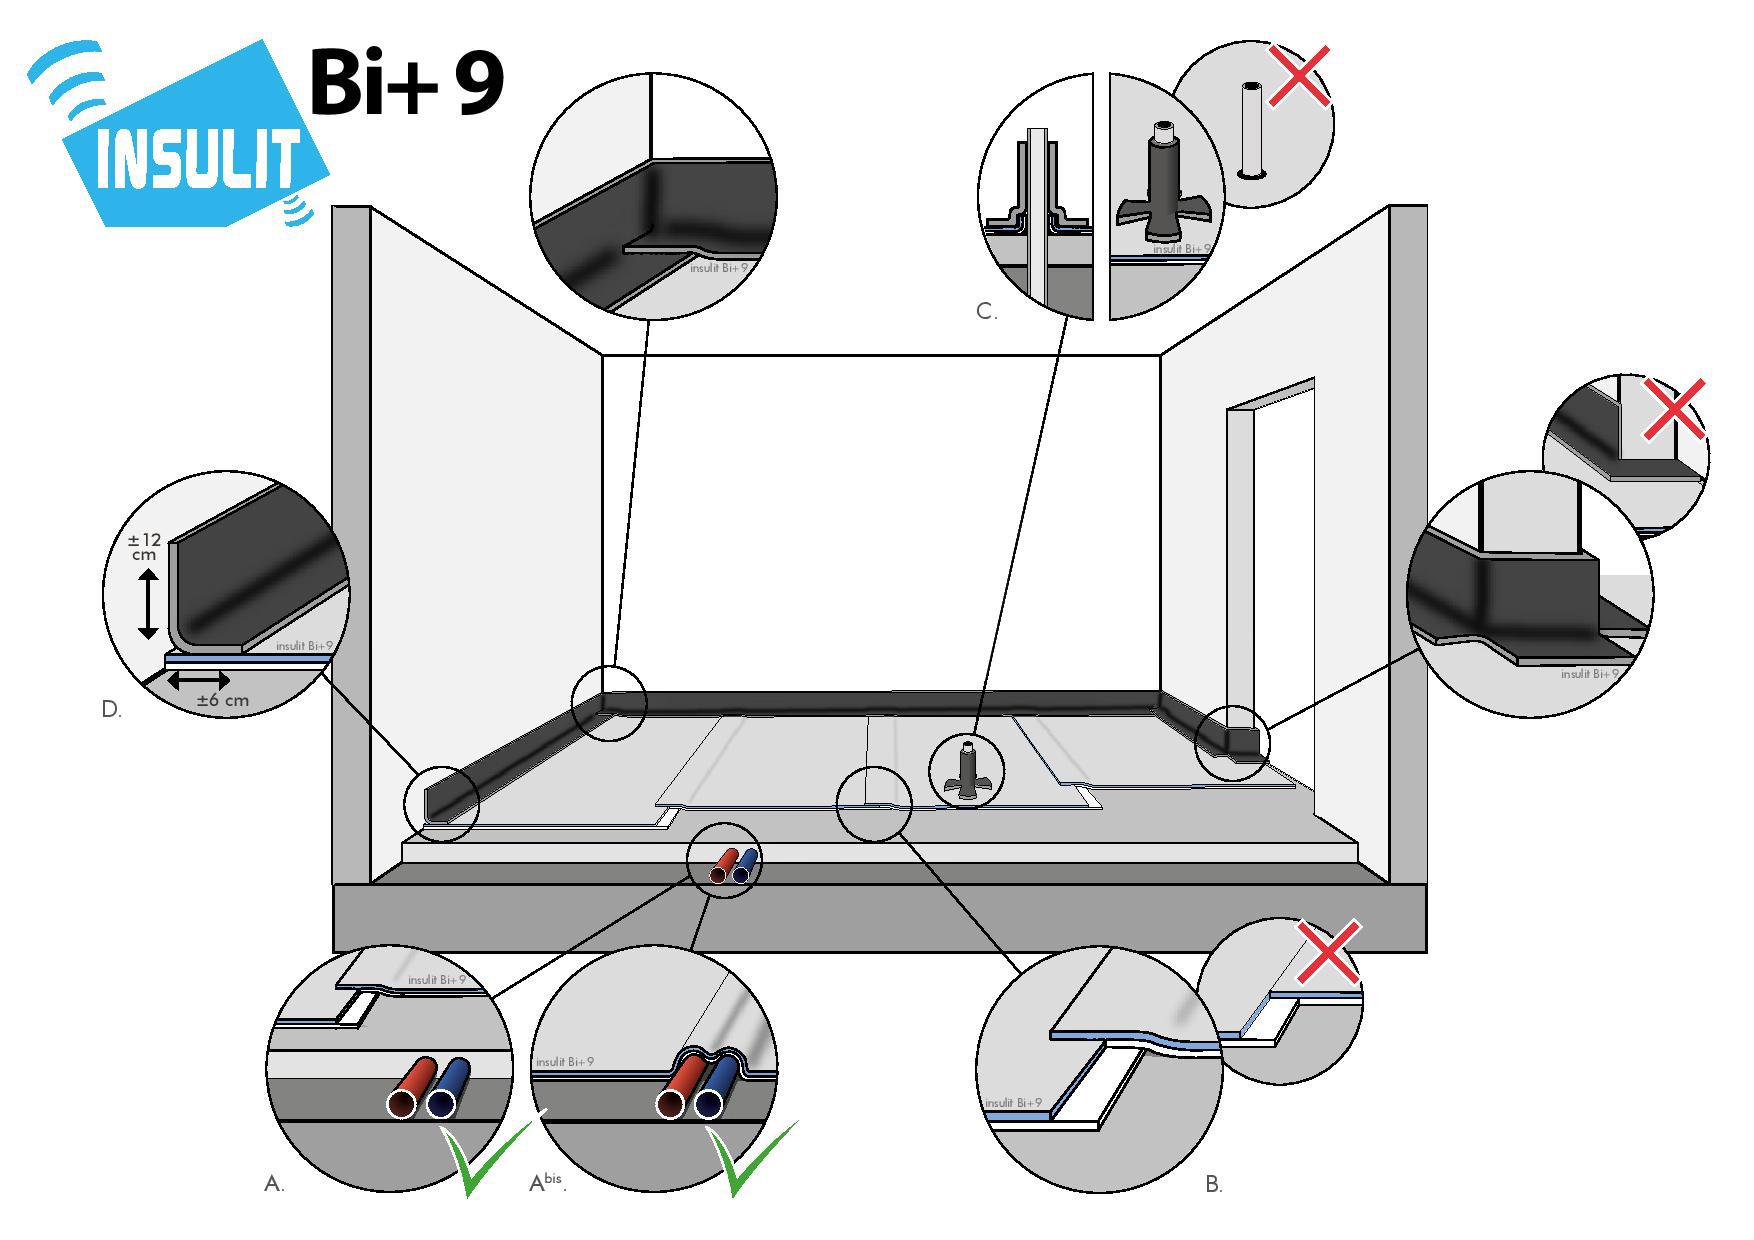 Insulit Bi+9 kročajová izolácia pod poter